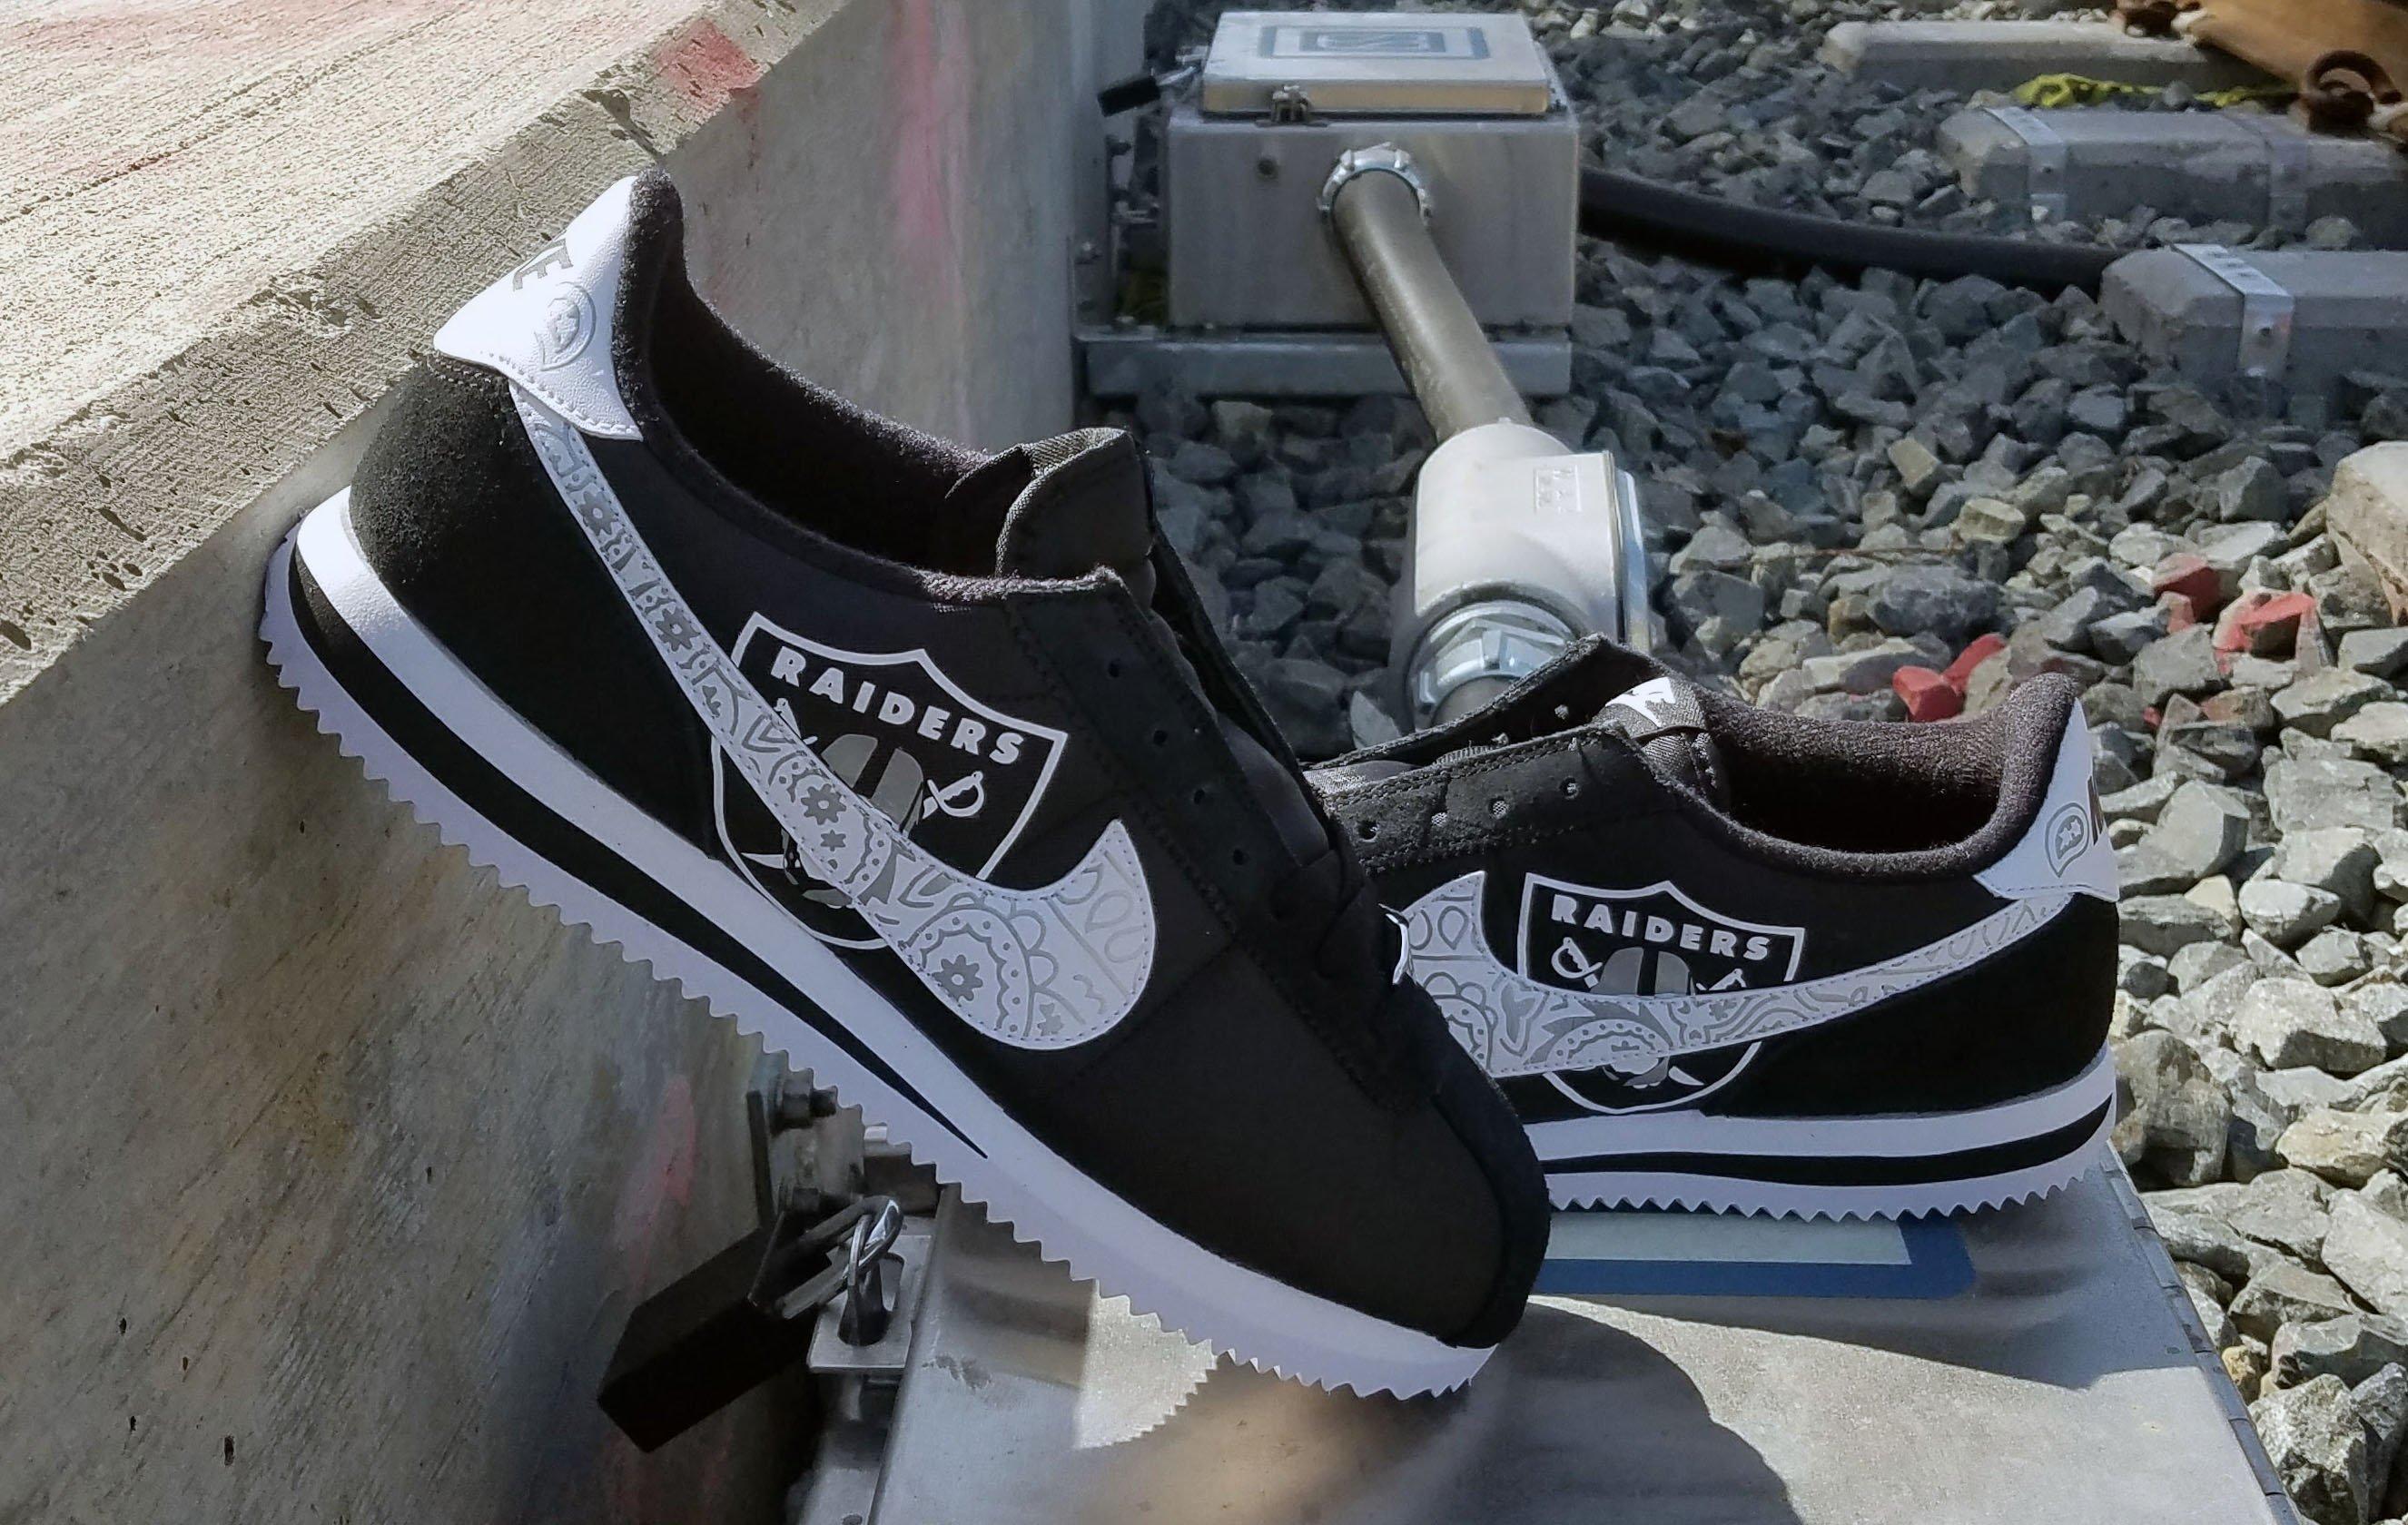 dd650f92 Bandana Fever Bandana Oakland Raiders Big Print Custom Black/White Nike  Cortez Shoes #sneakers #trending #sports #mensfashion #art #sportsaction  #fashion ...